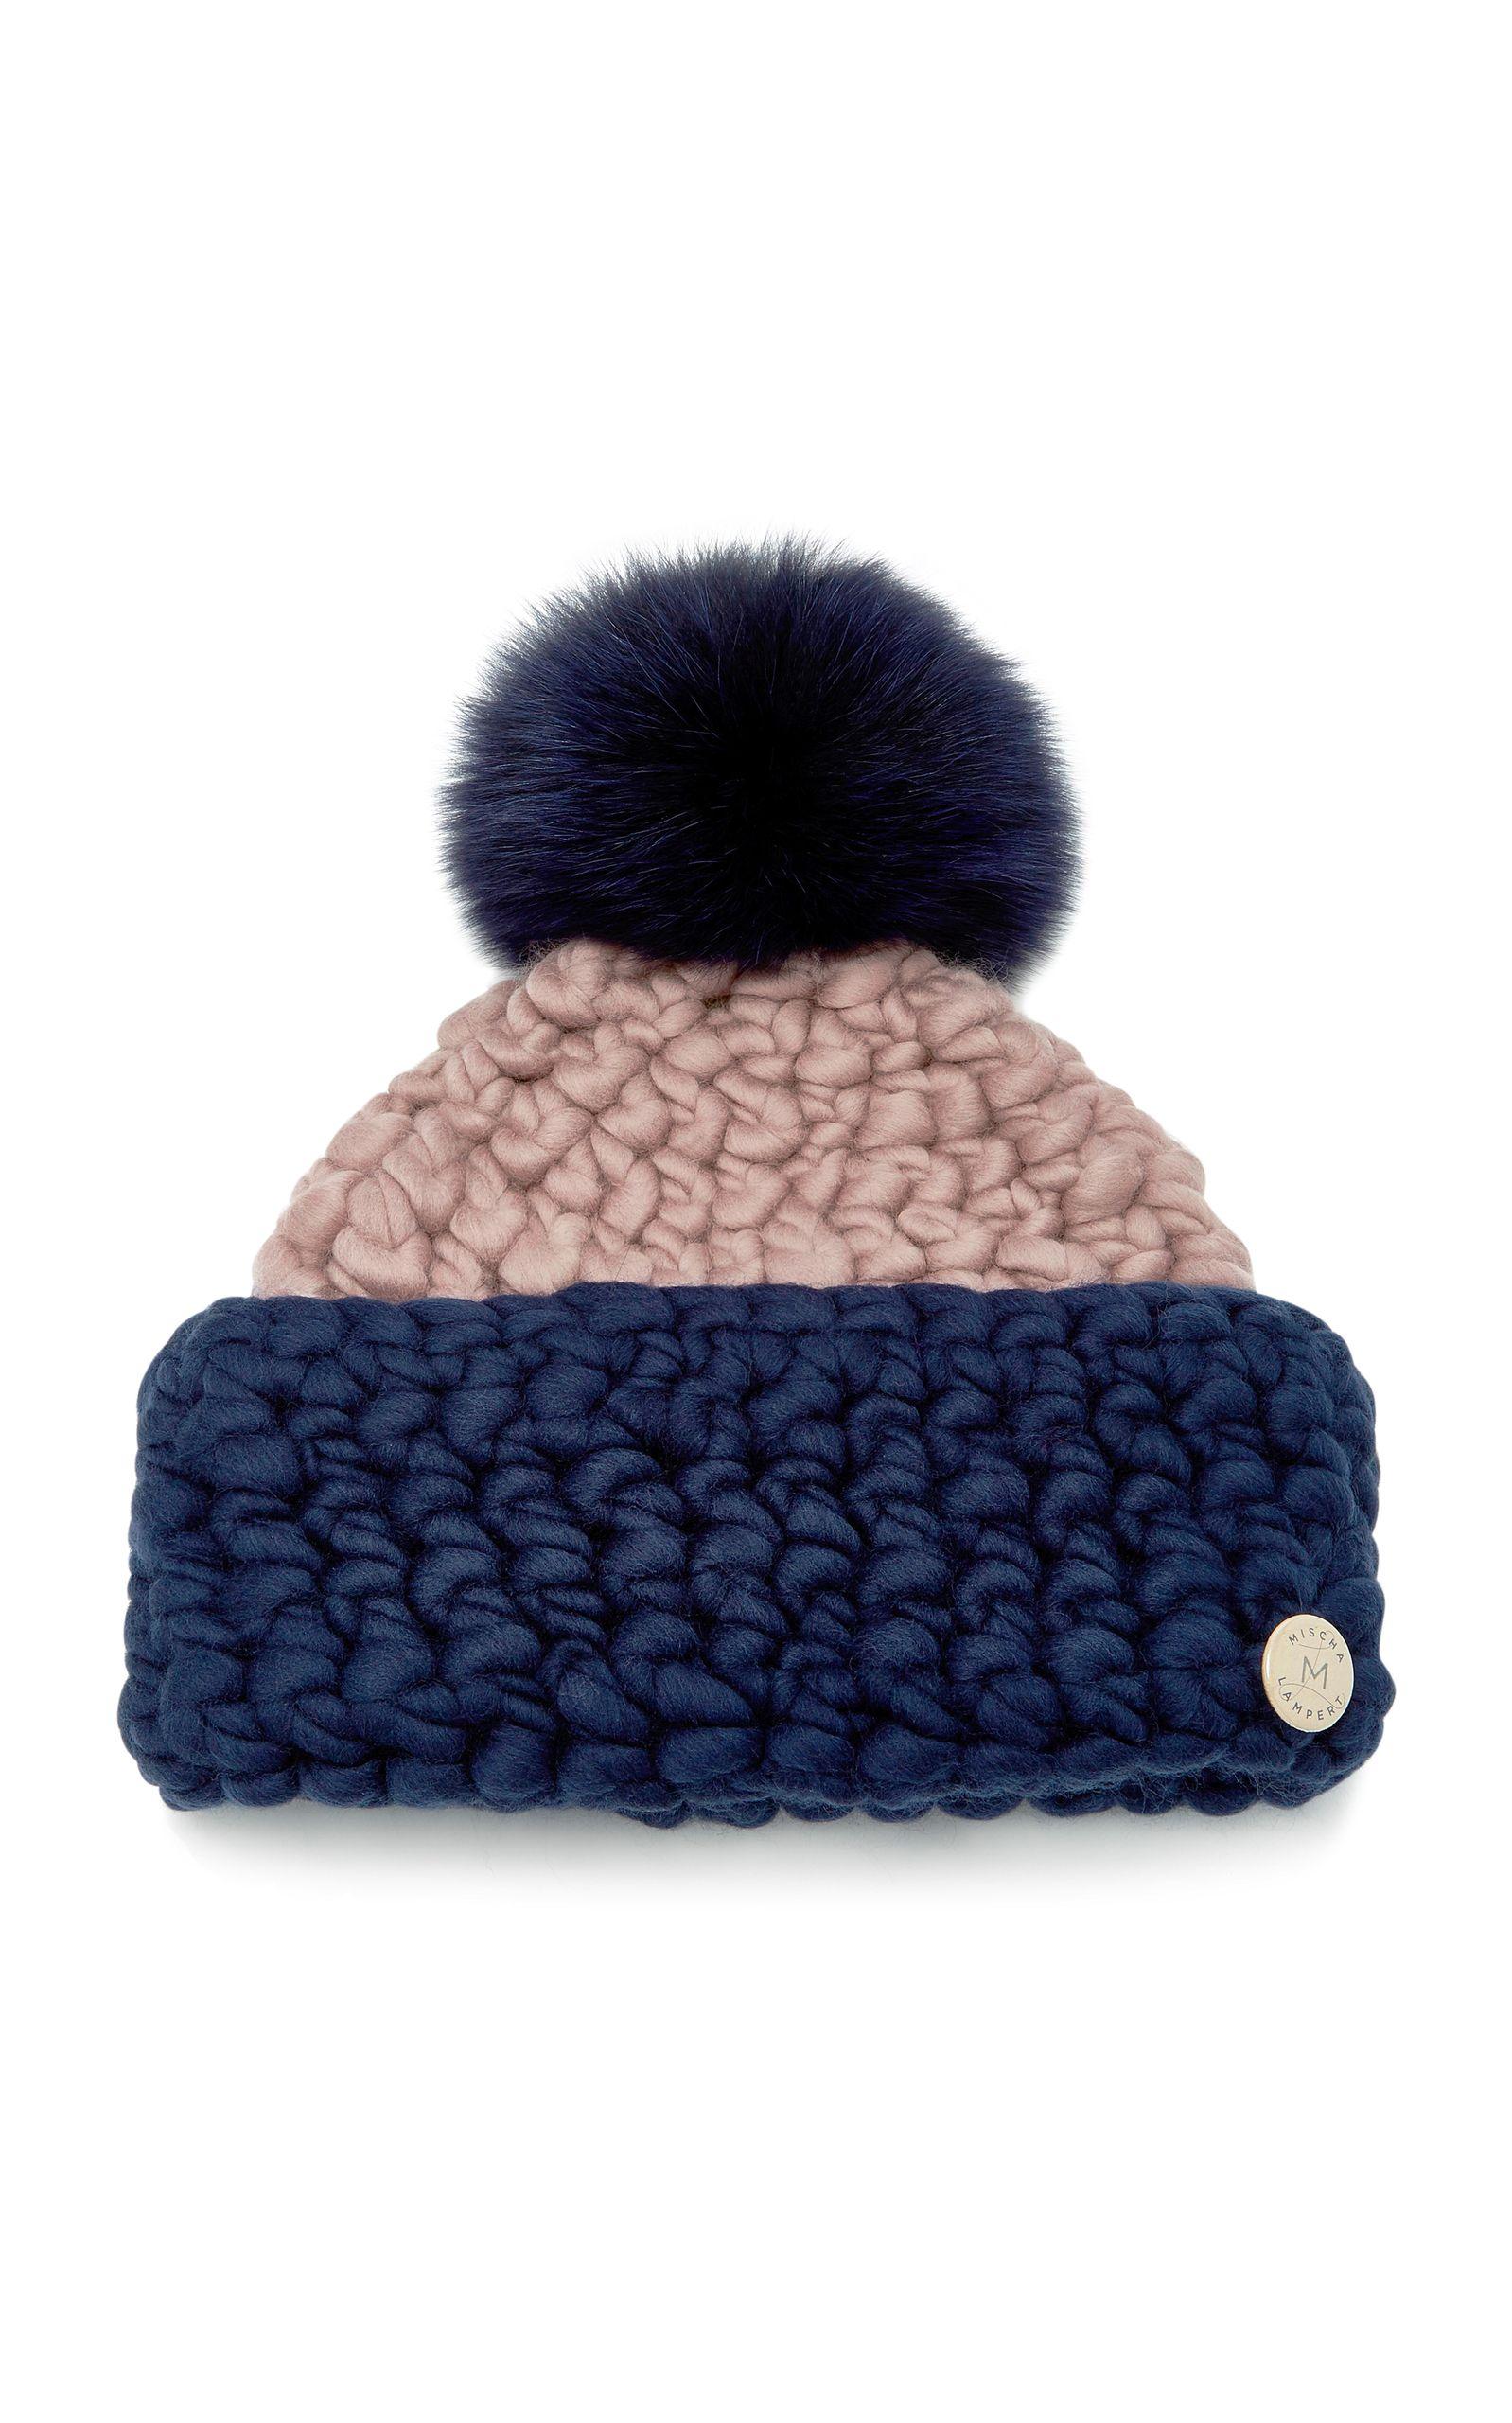 Striped Fox Fur-Trimmed Merino Wool Beanie Mischa Lampert QEsrufGR7j